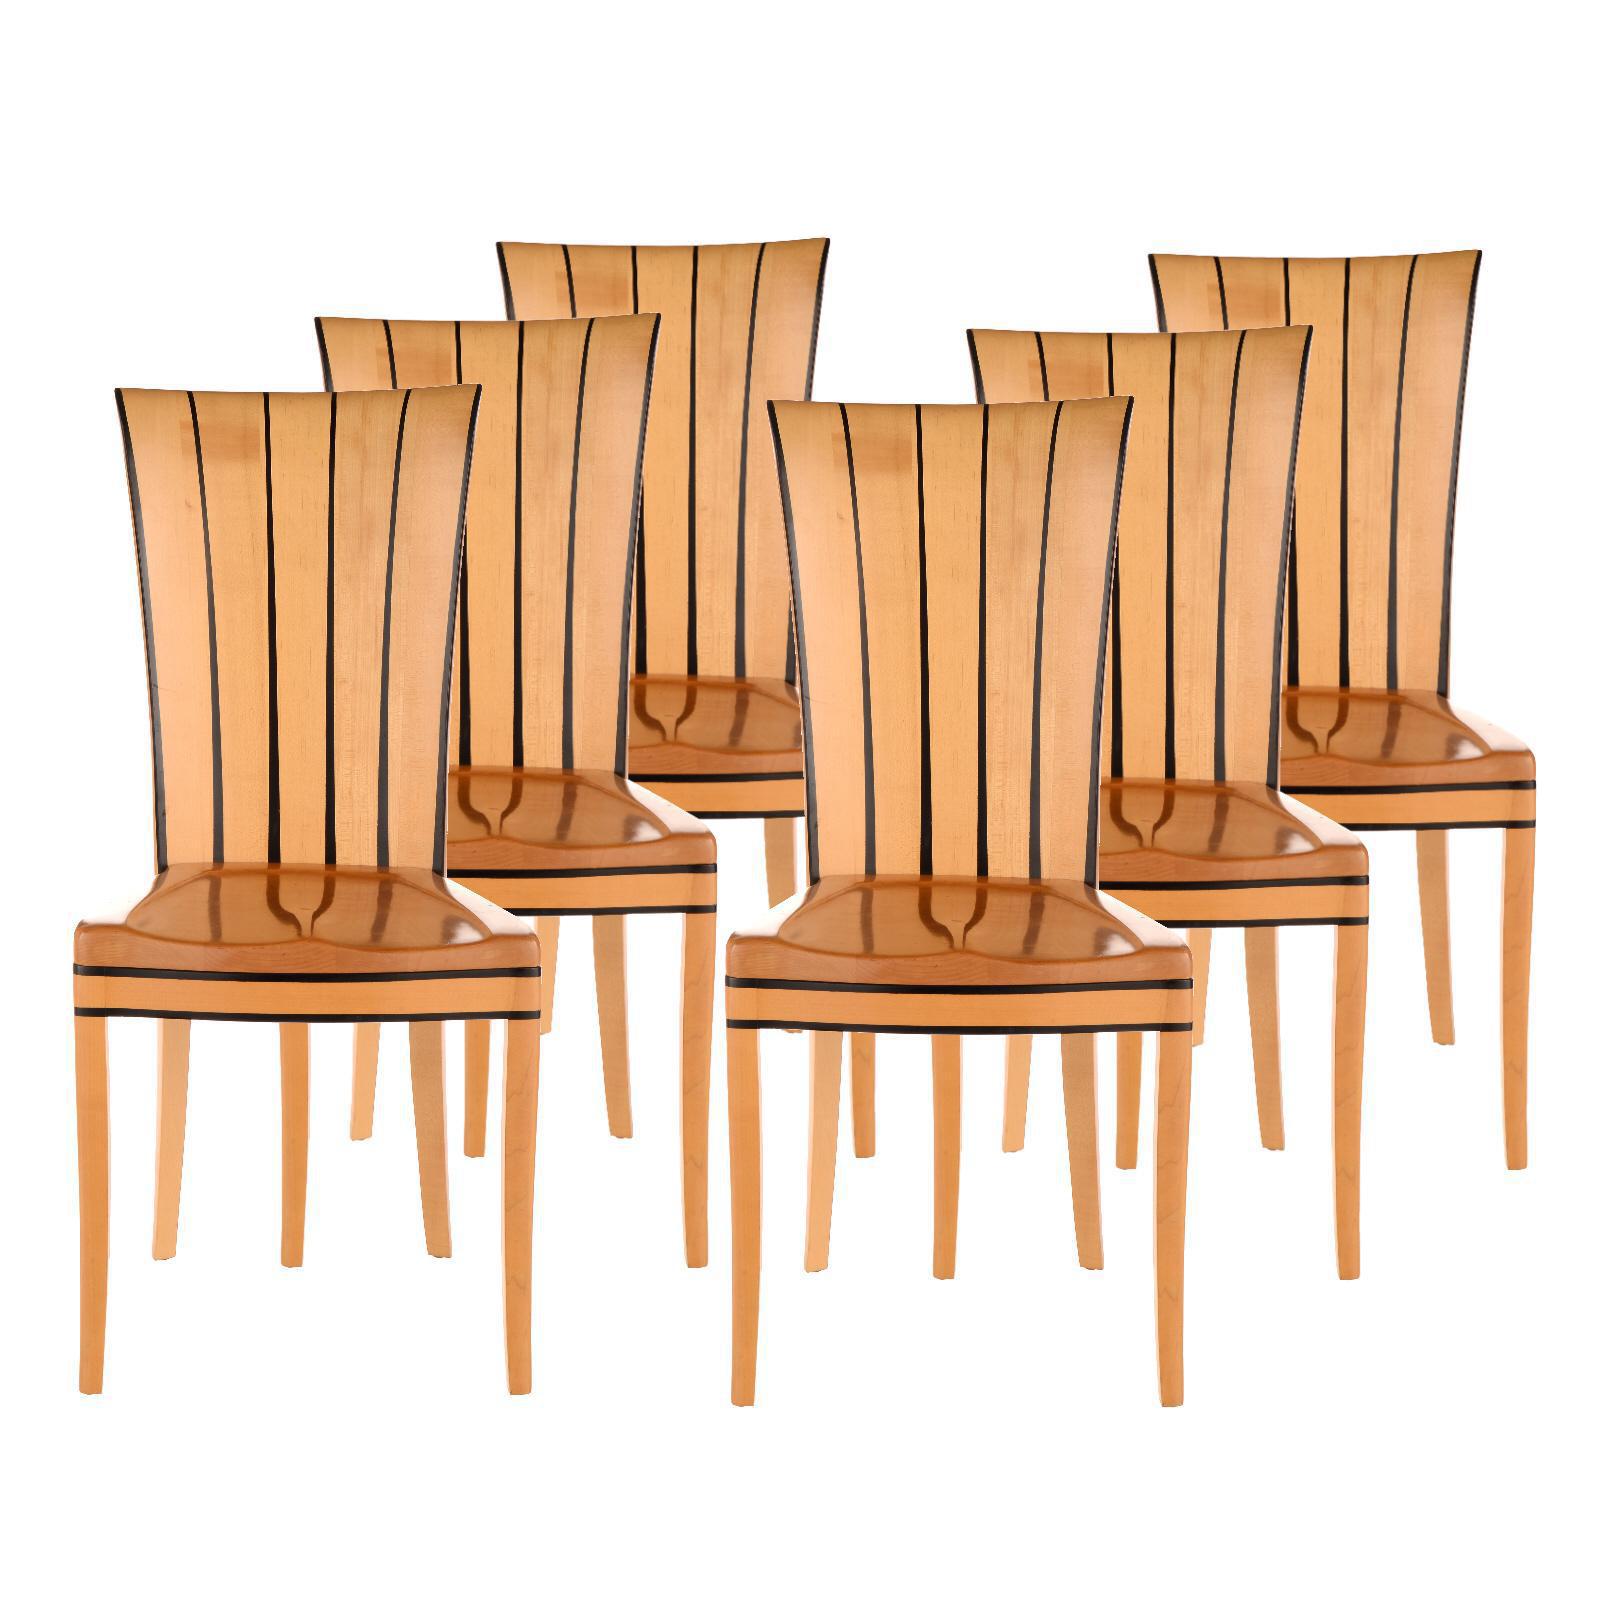 eliel saarinen for arkitektura dining chairs set of 6